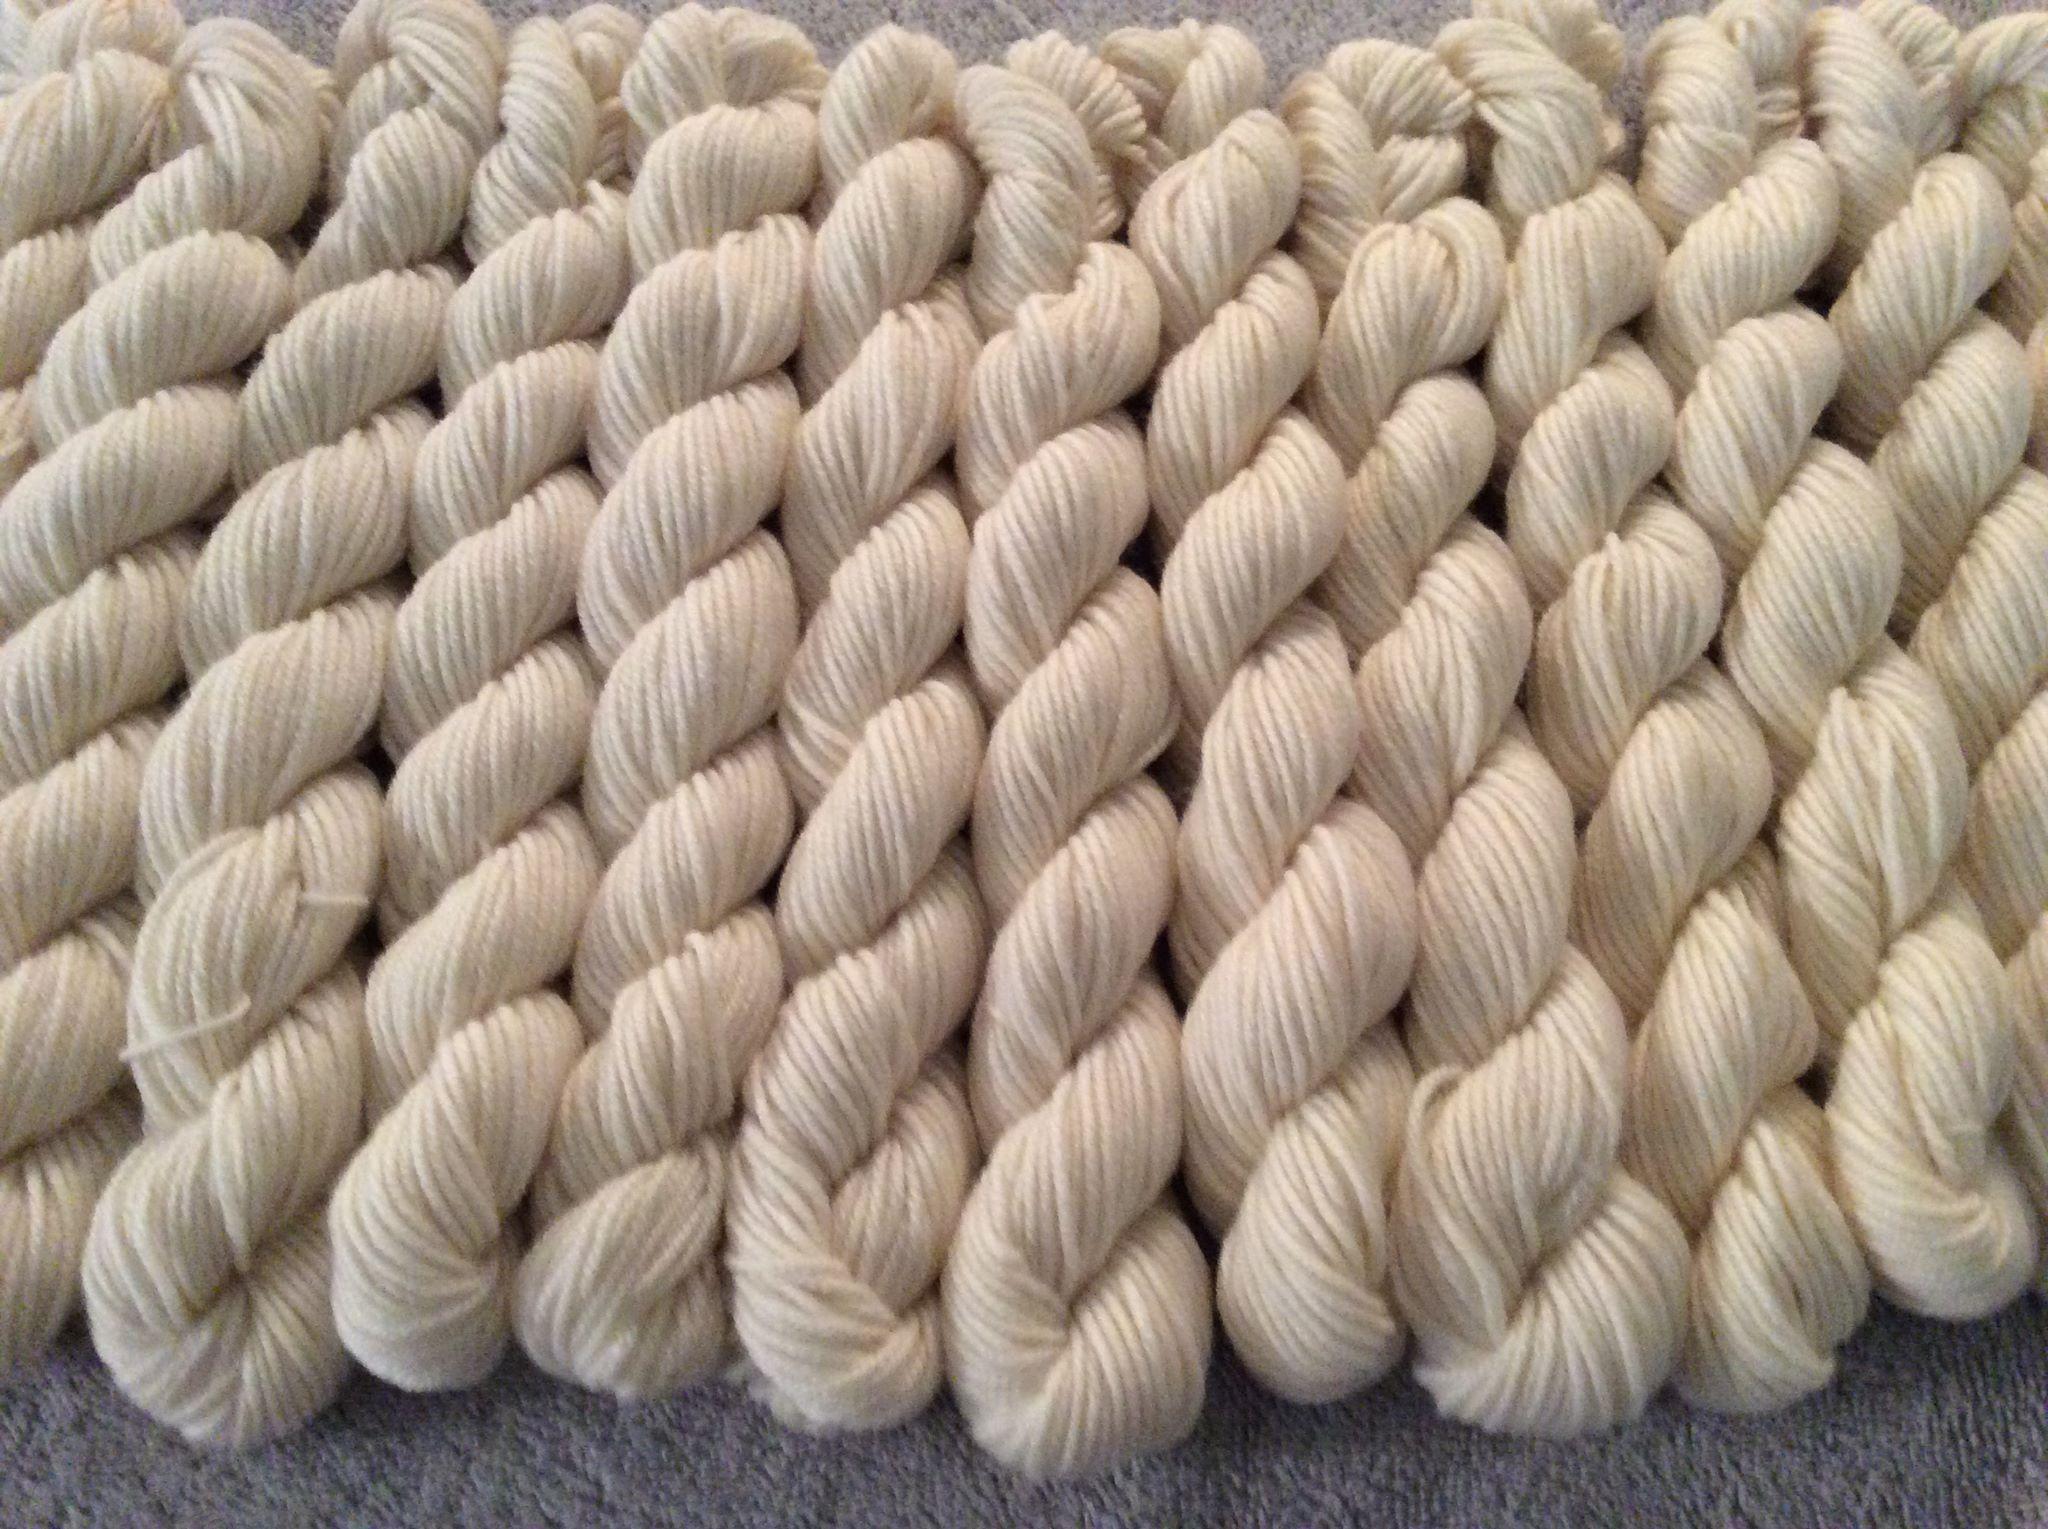 Bare Yarn!! - We start with the bare yarns